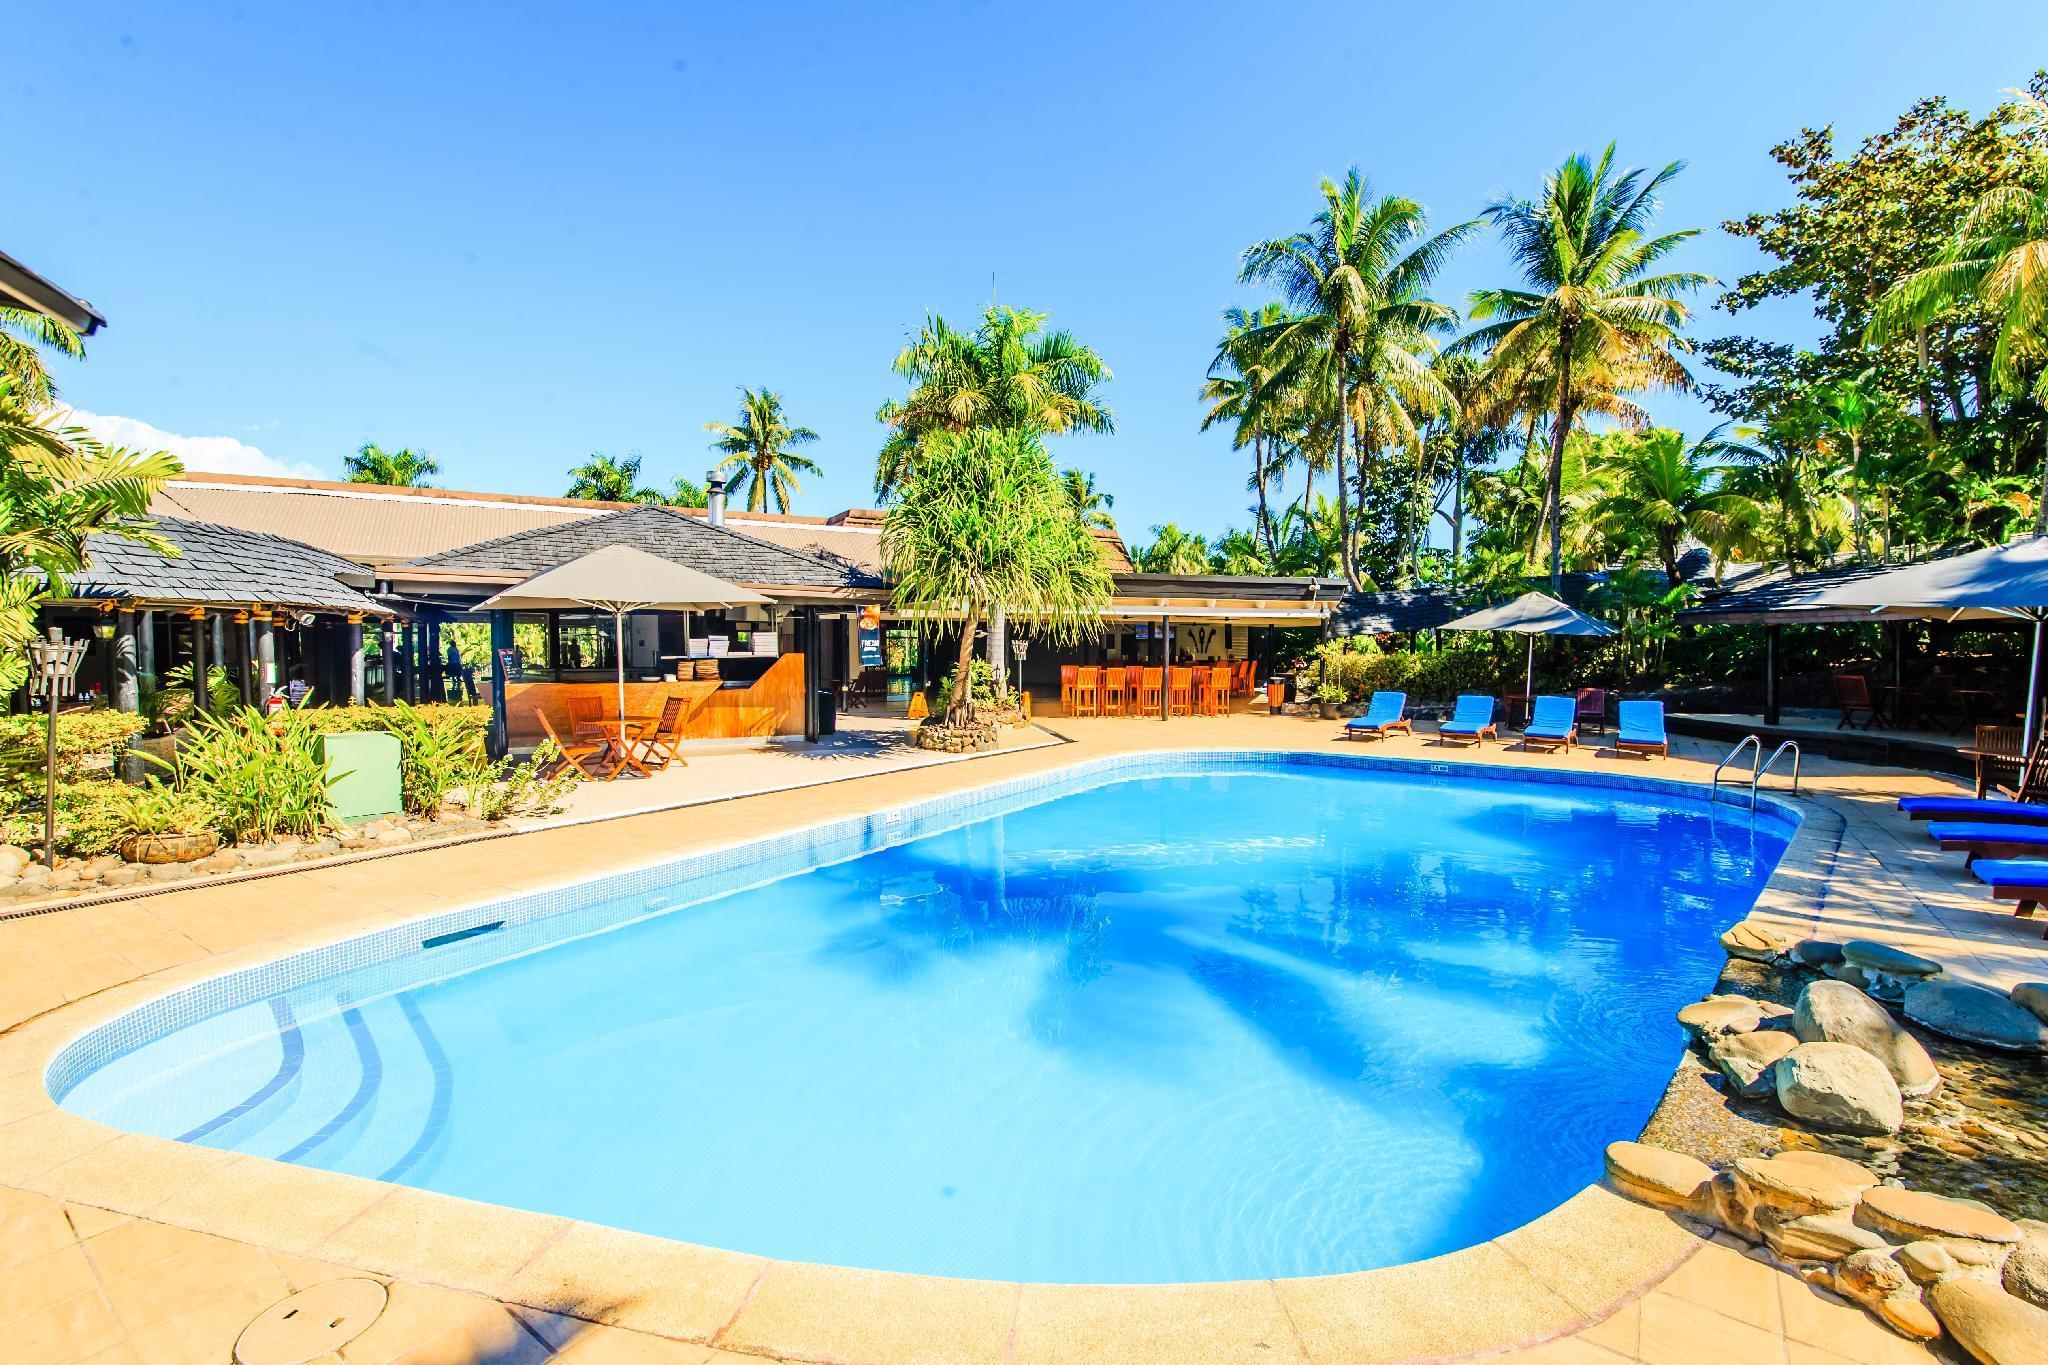 Tanoa International Hotel